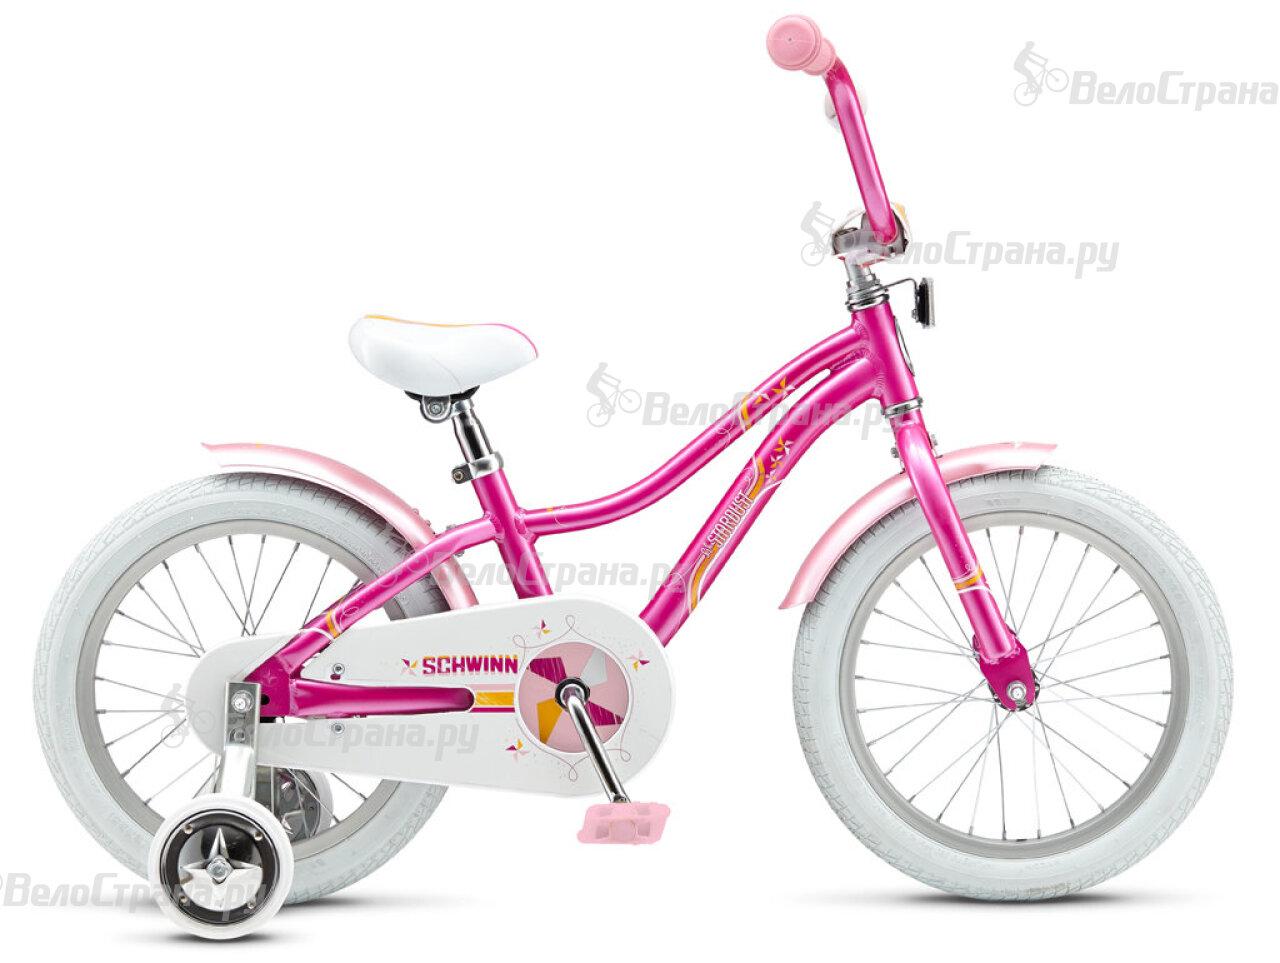 Велосипед Schwinn Lil Stardust (2015)